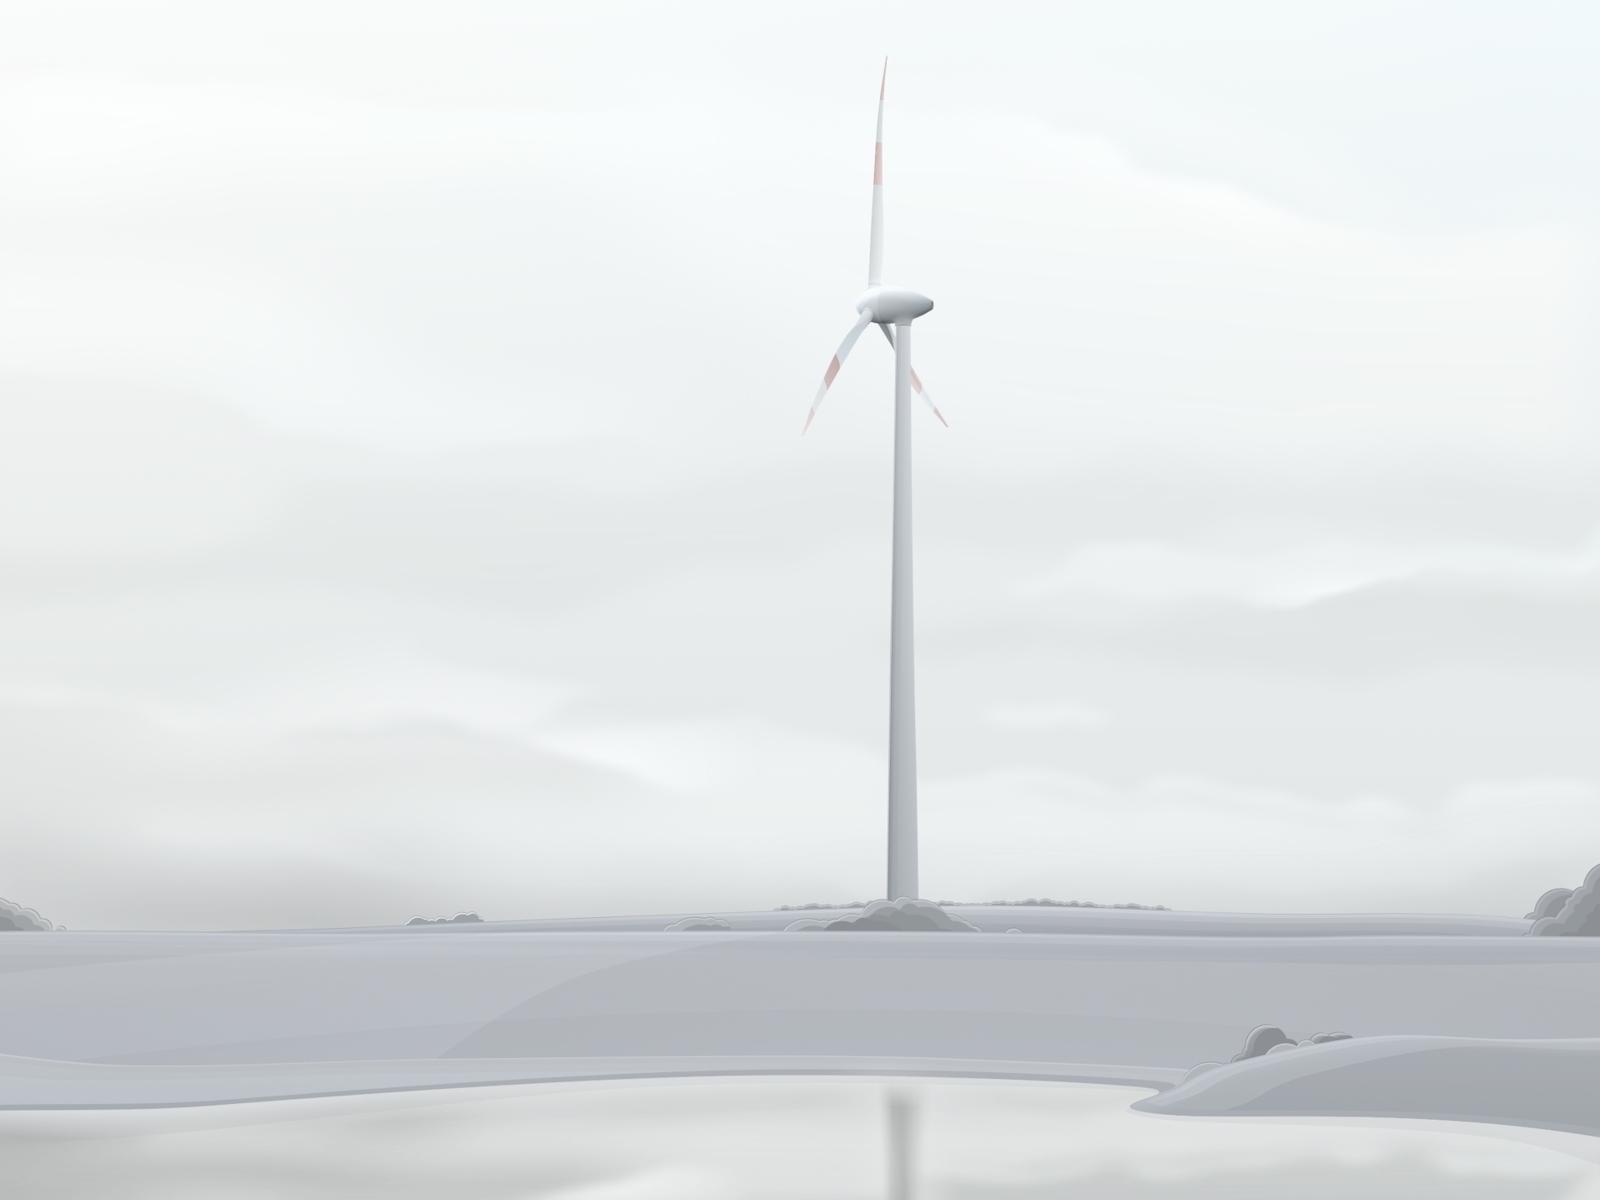 Wind Turbine wallpapers HD quality